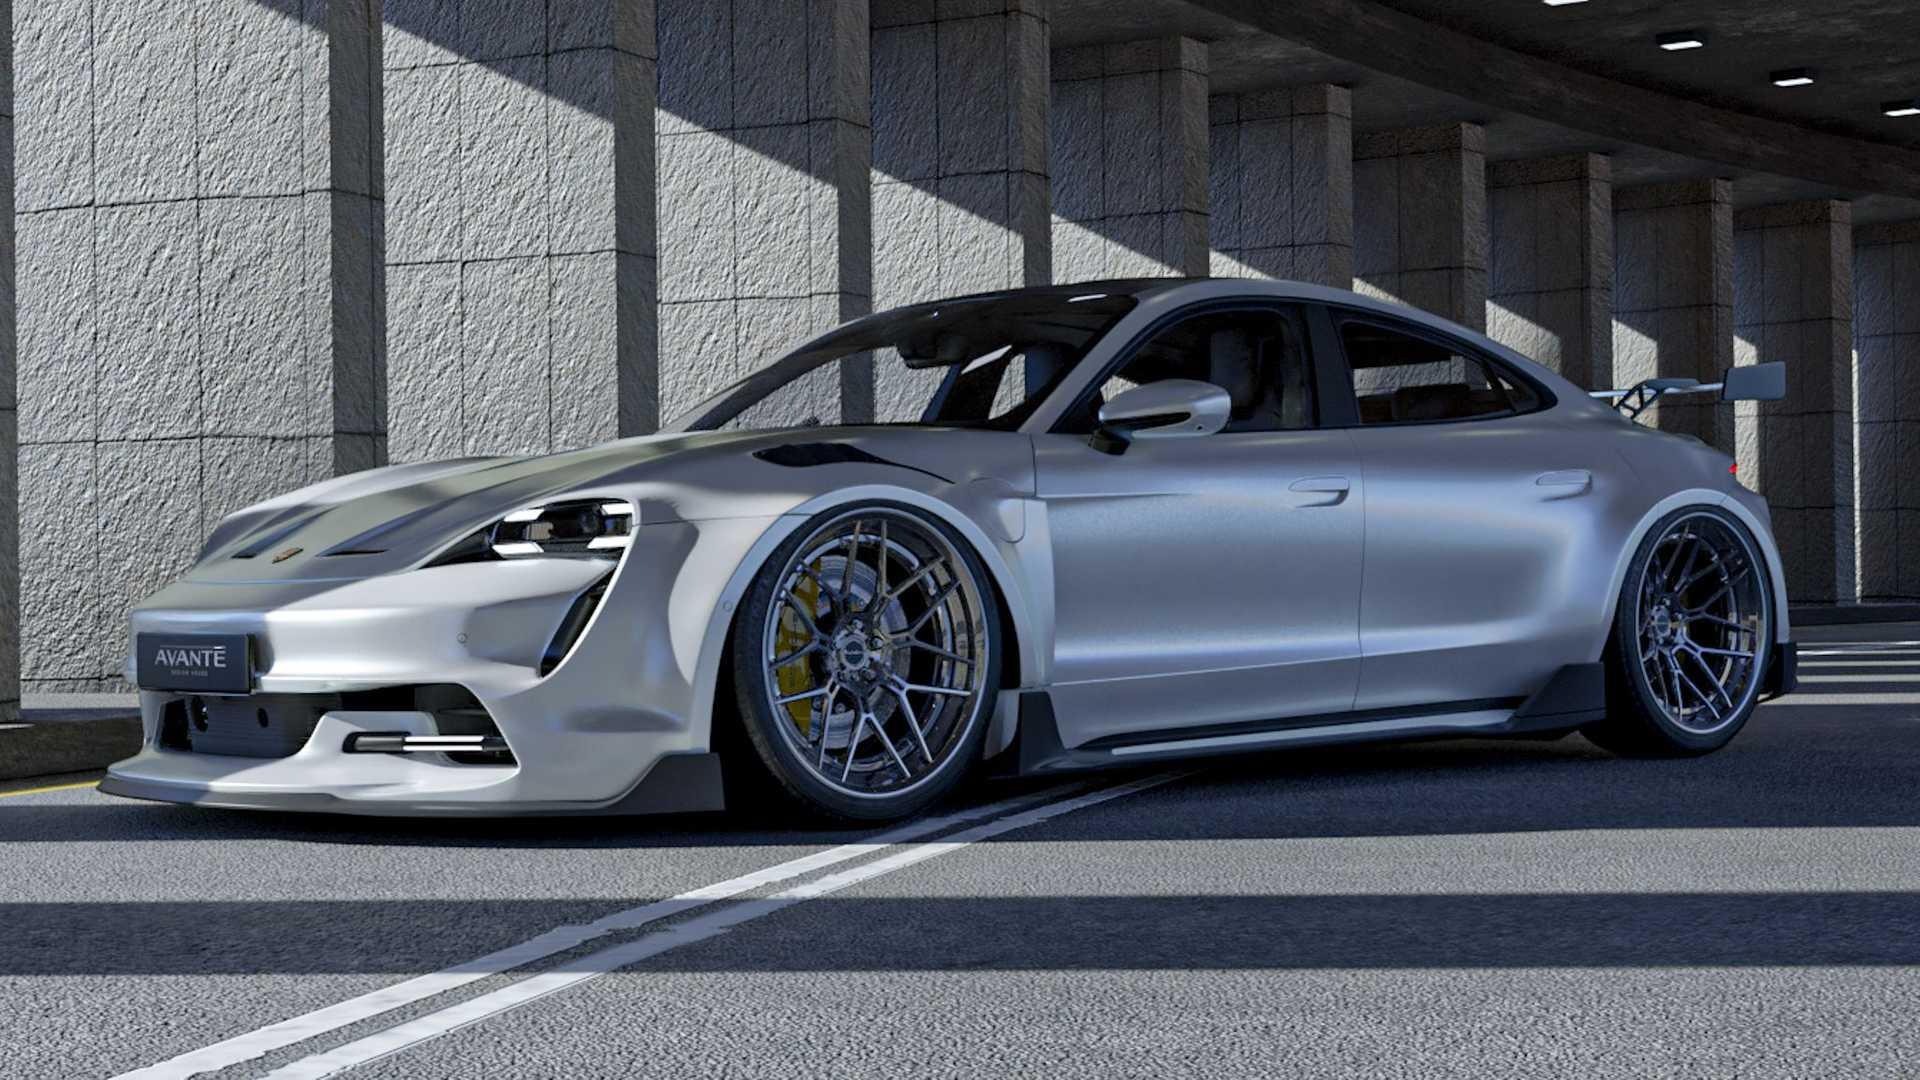 Porsche-Taycan-by-Avante-Design-1